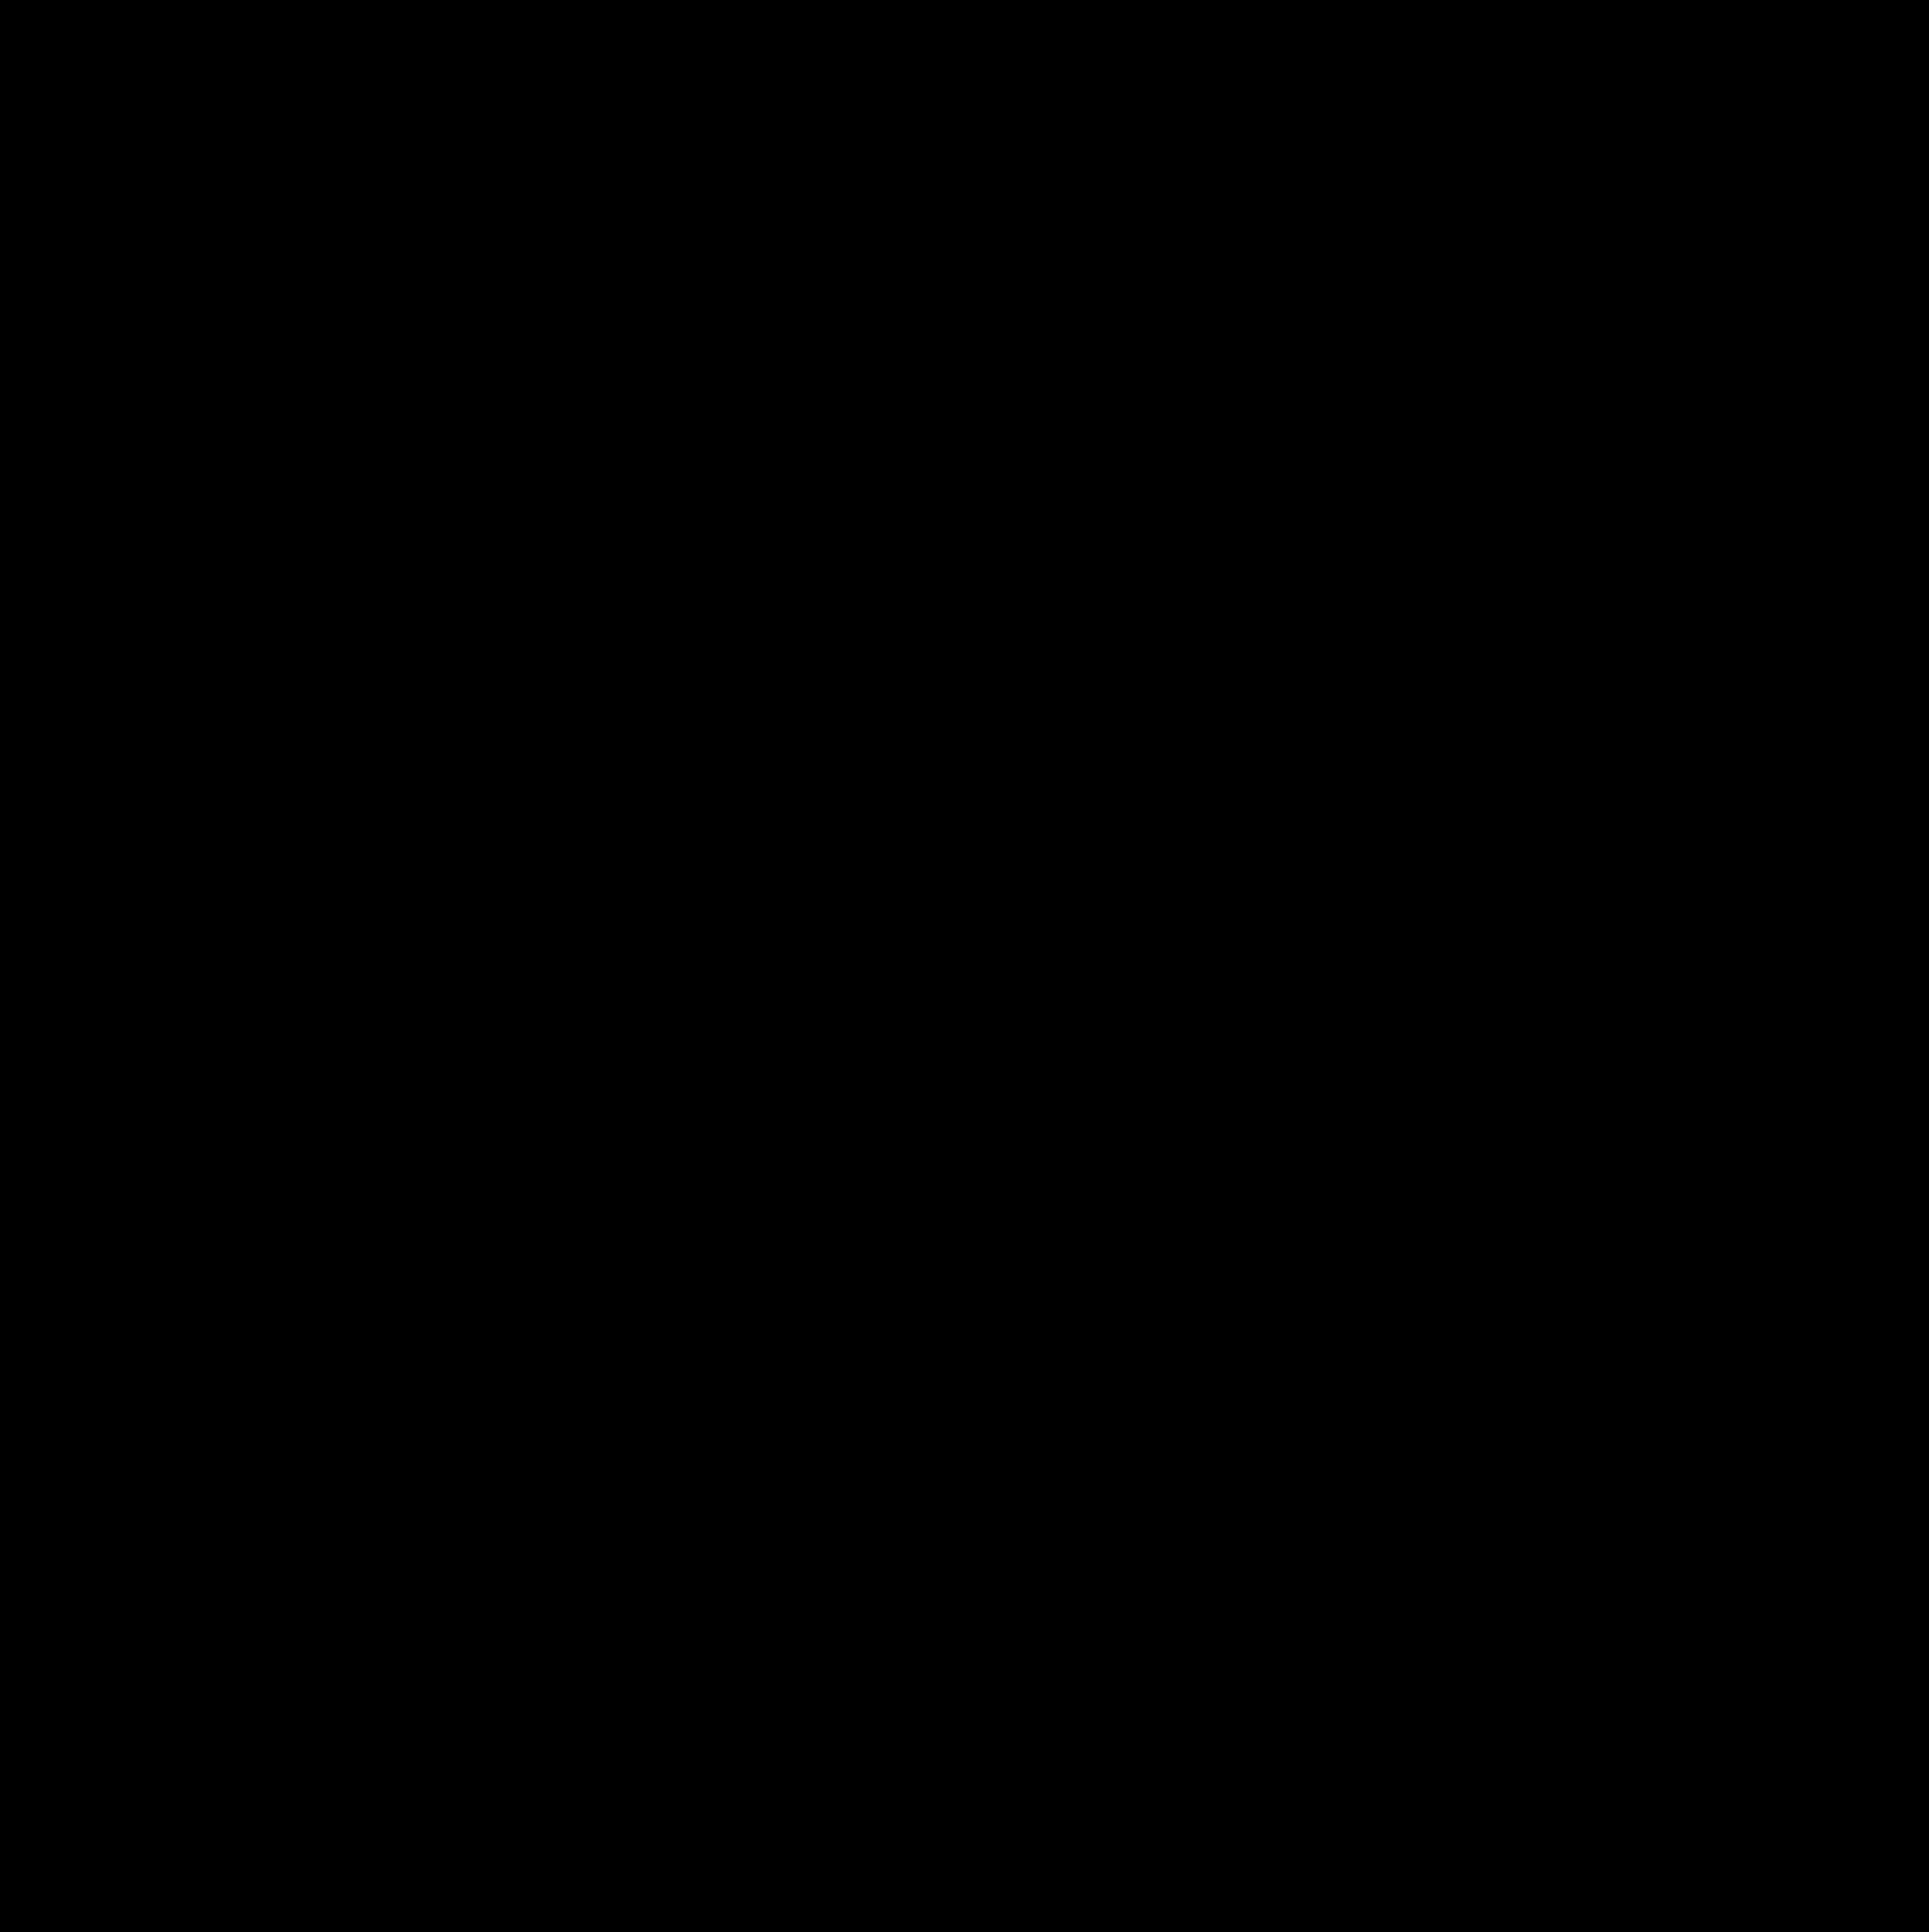 lancewood-ray-marfil-blanco-3